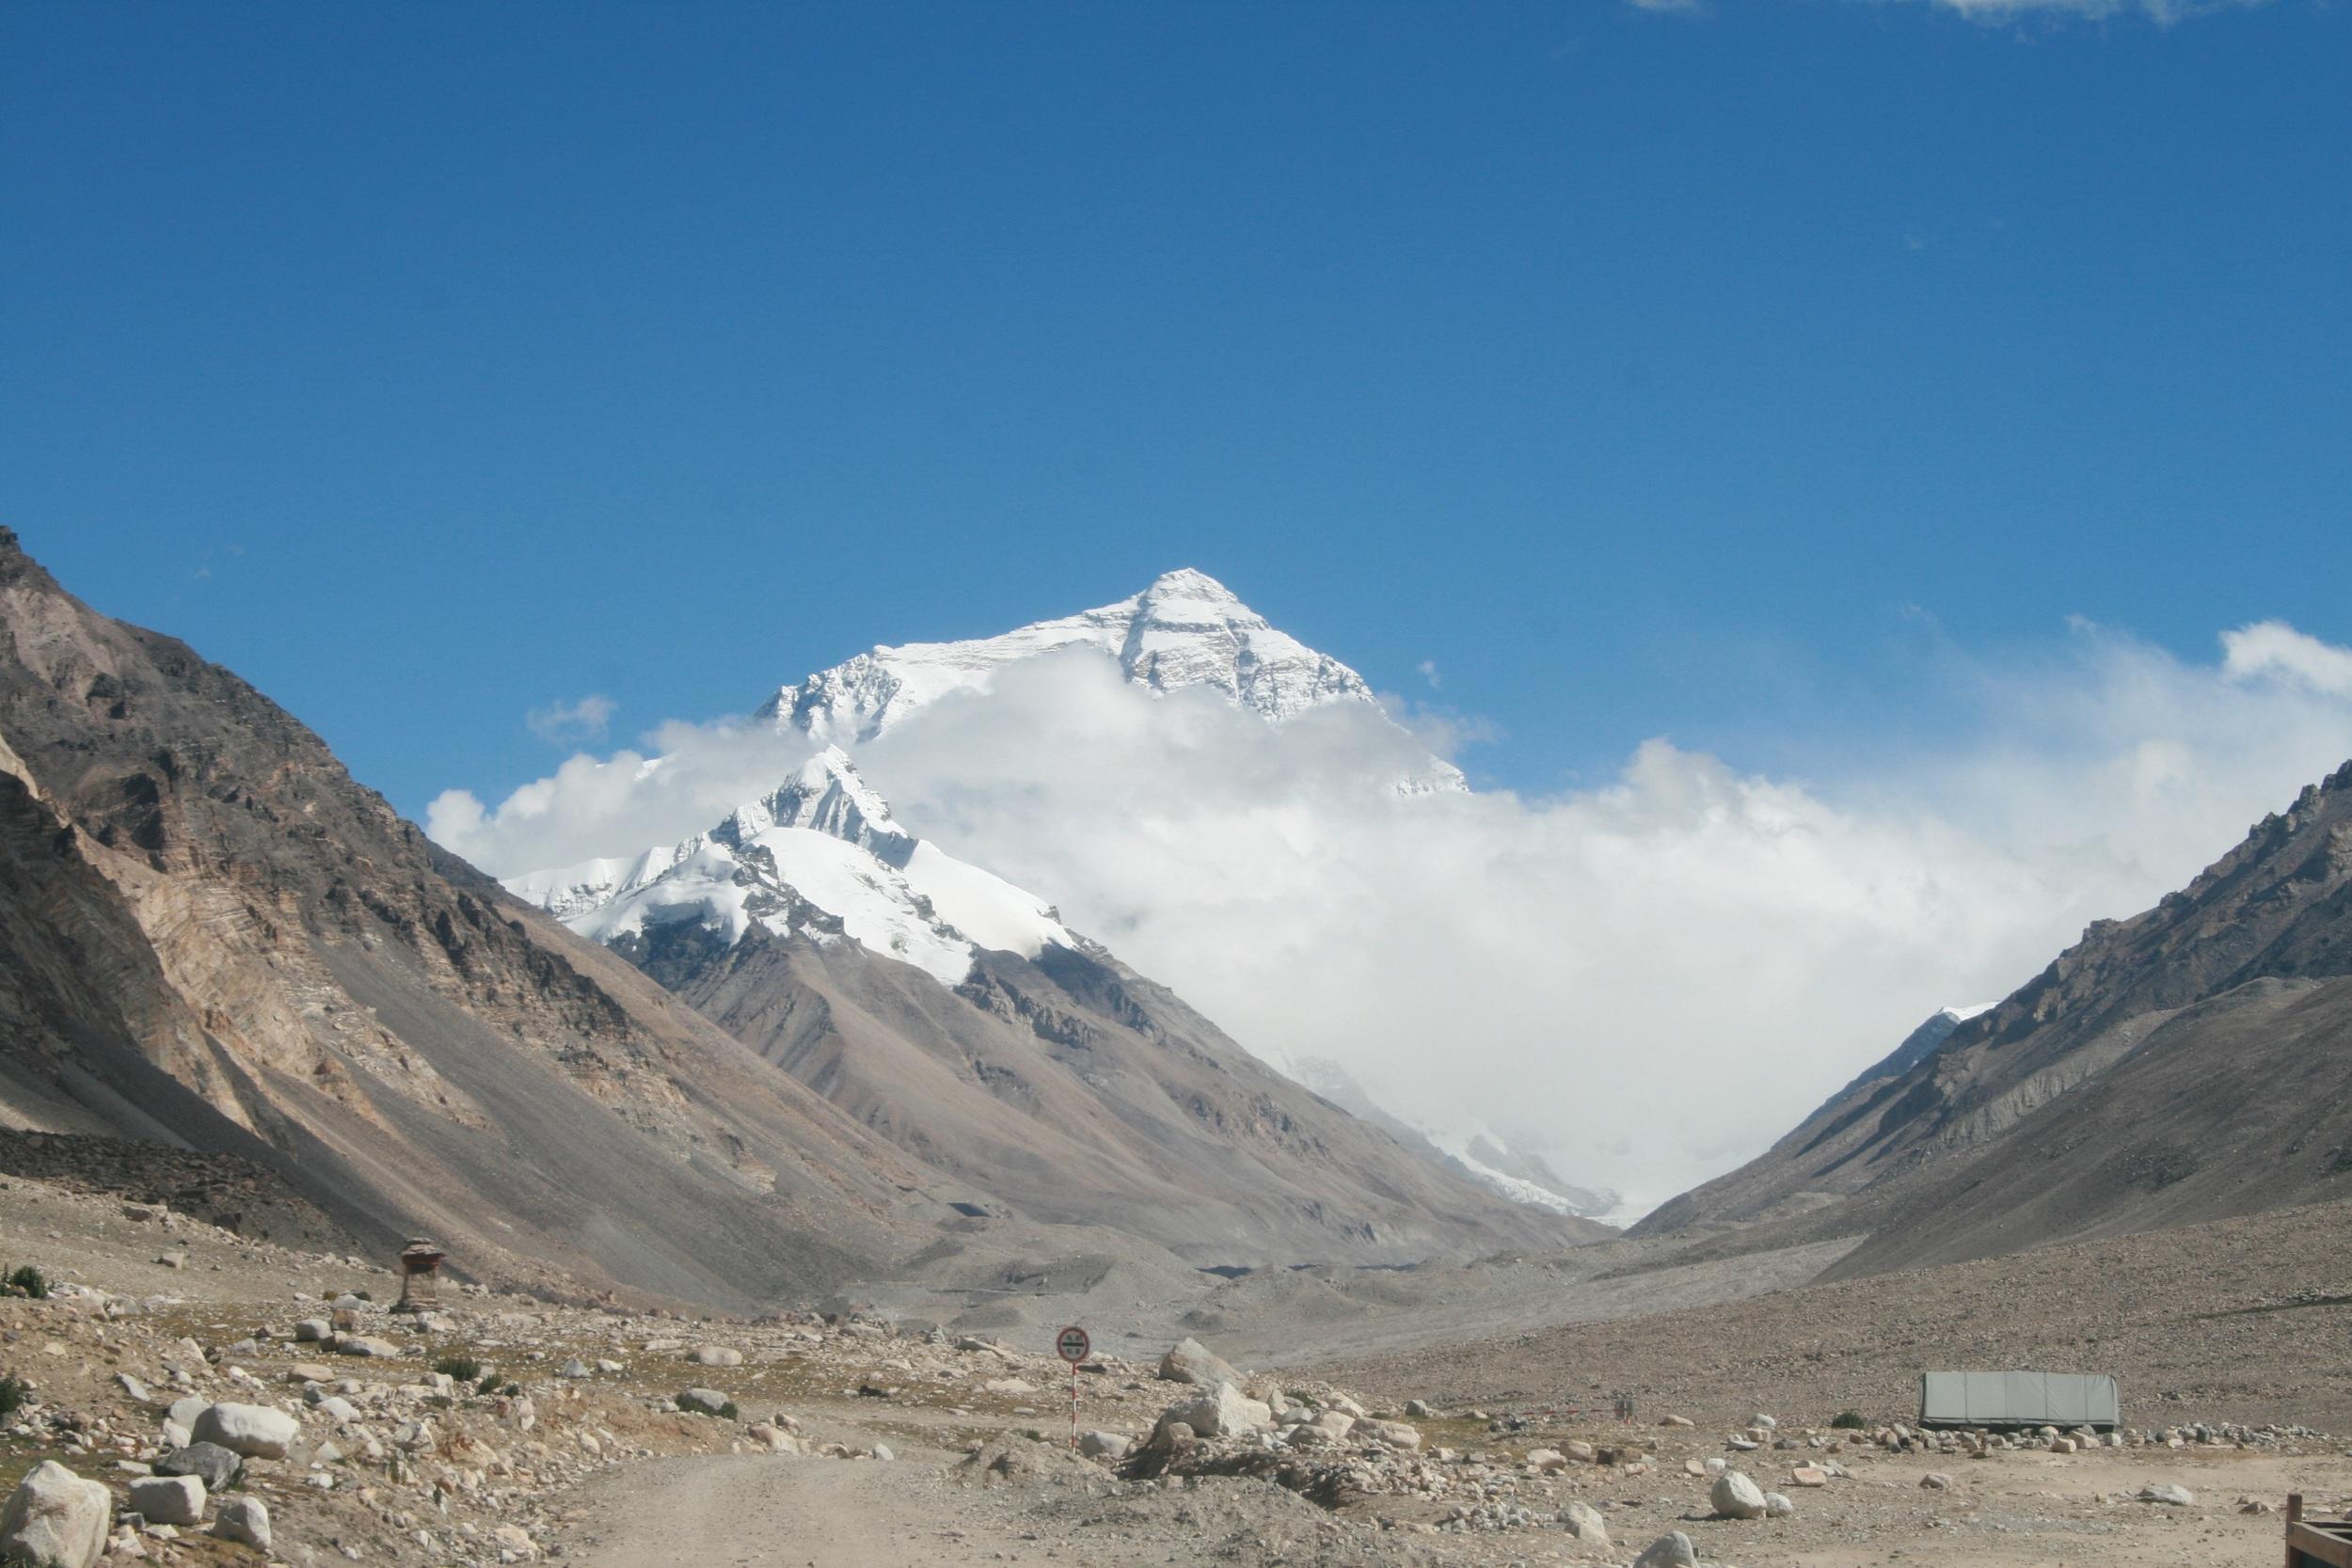 Everest, Nepal – 29,035' (8850m)